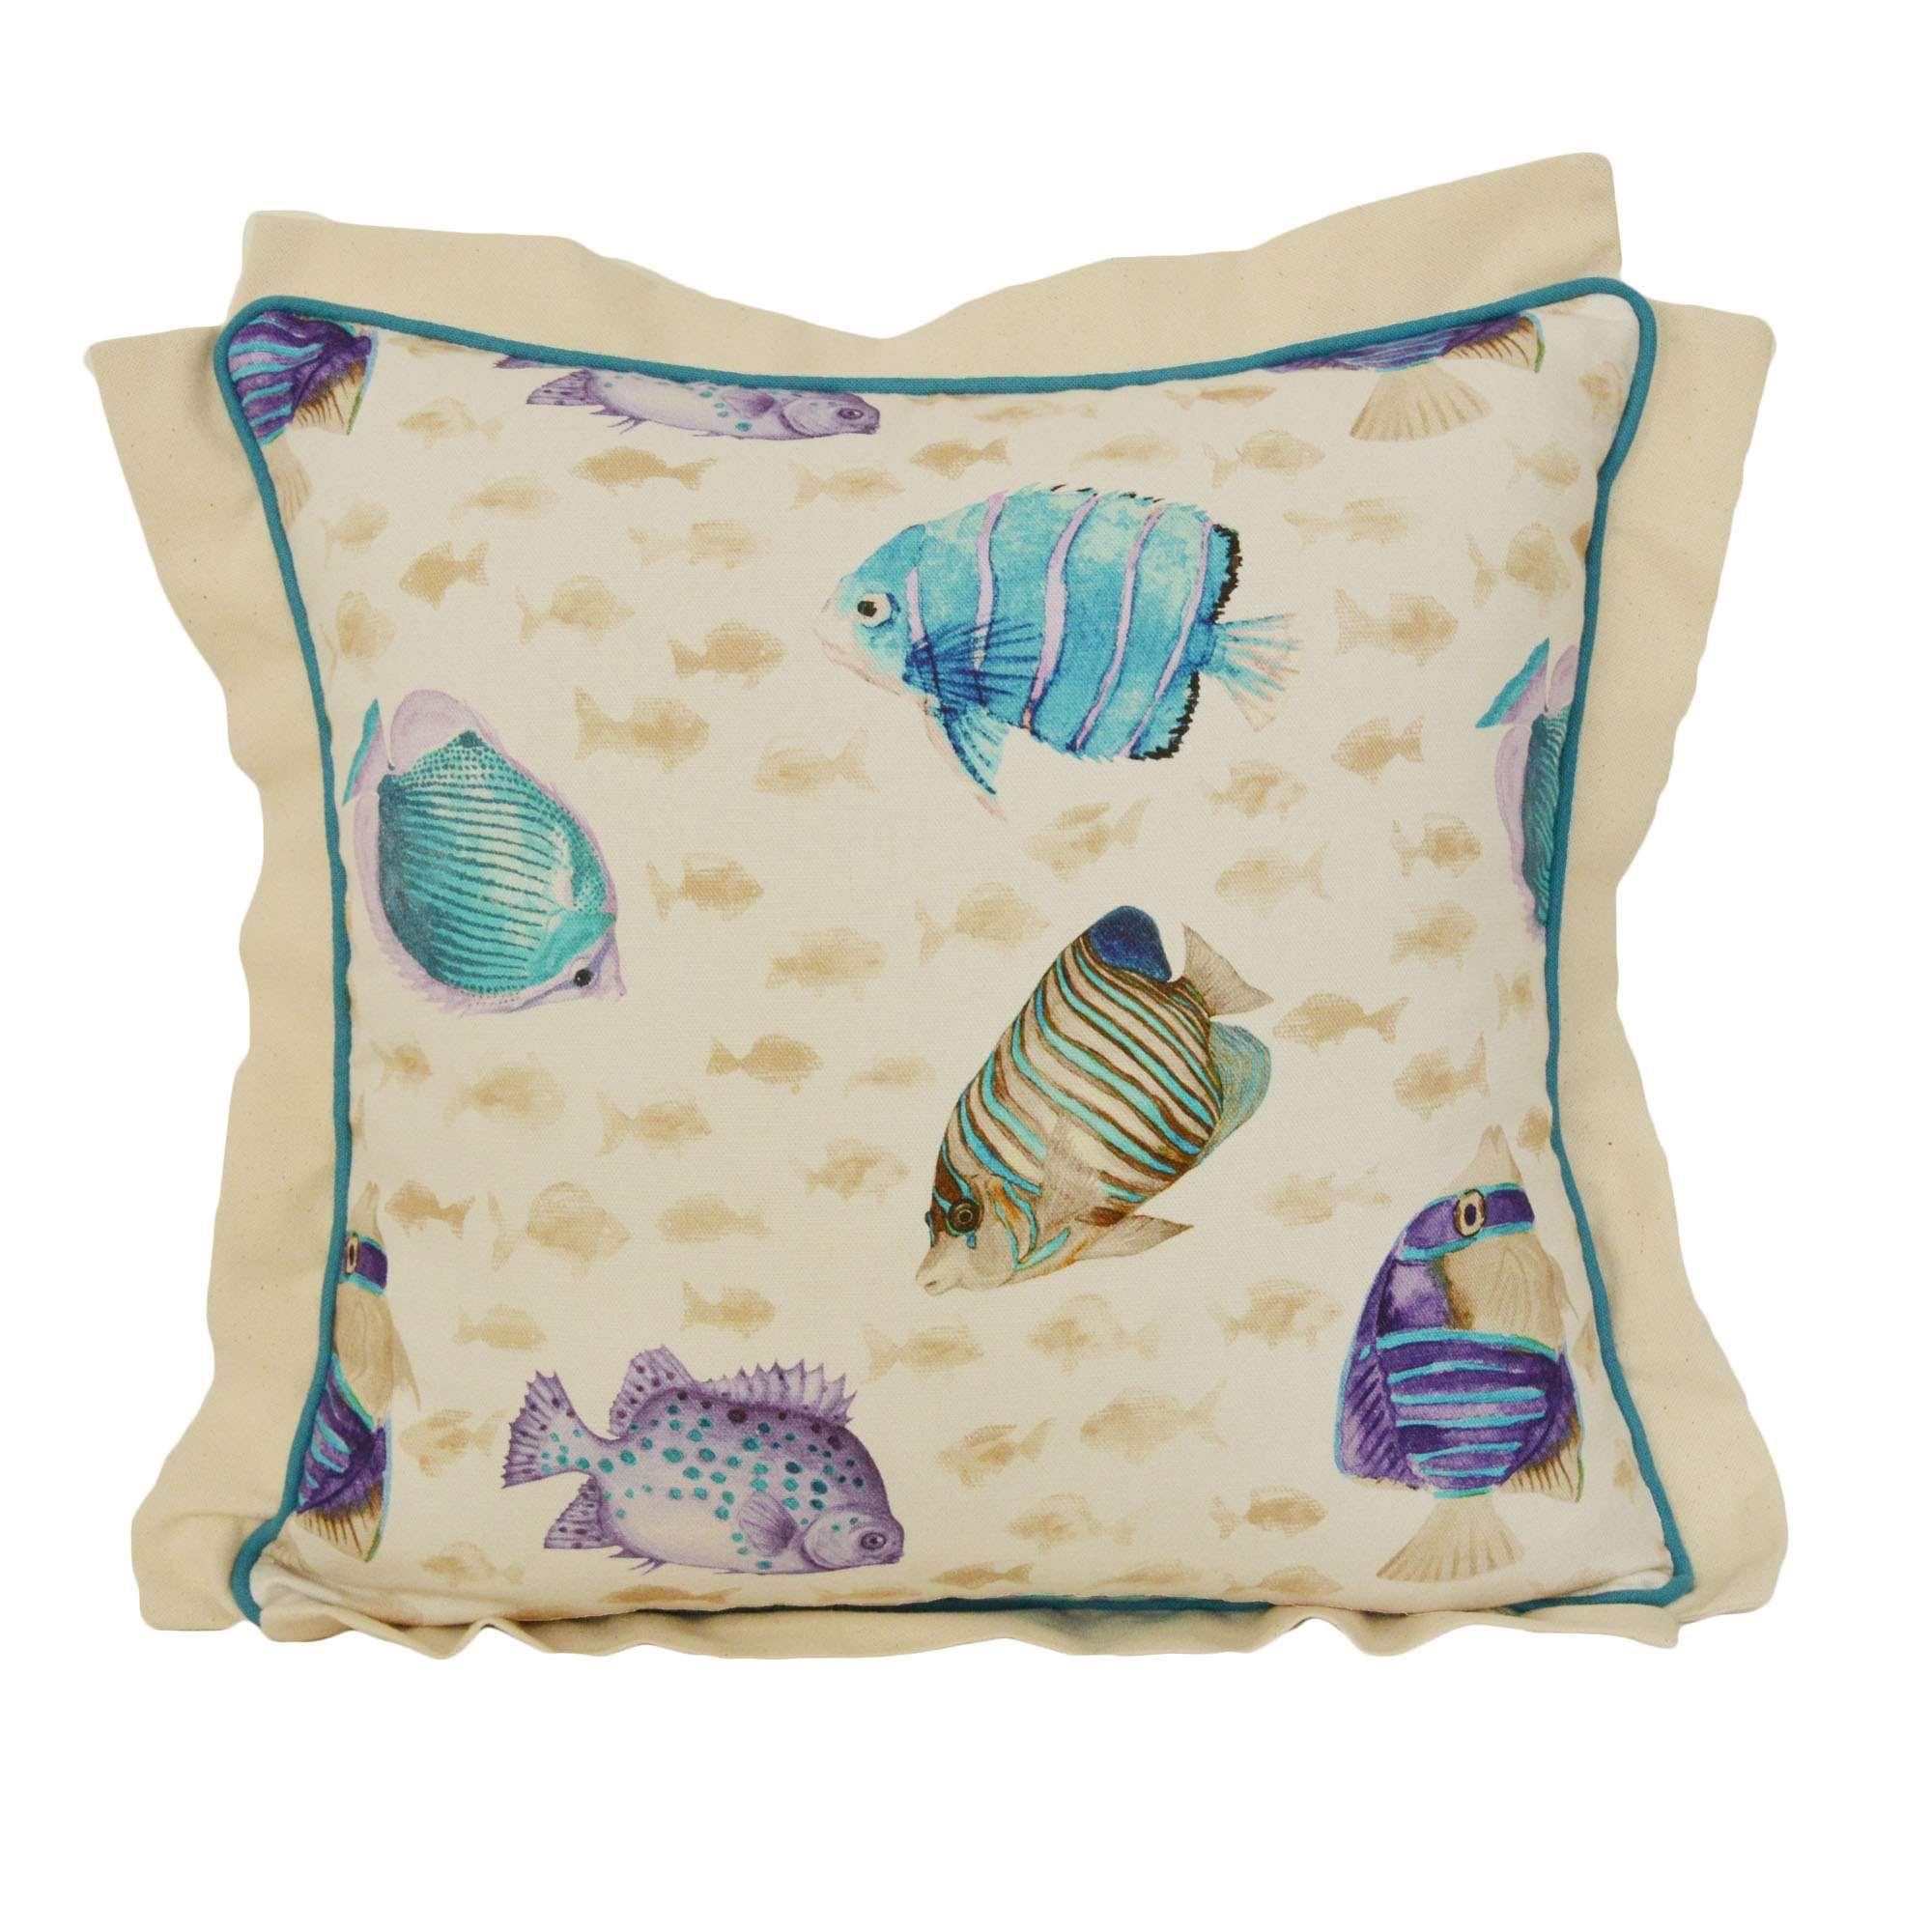 Federa cuscino fantasia pesci tropicali tina codazzo home for Misure cuscino carrozzina